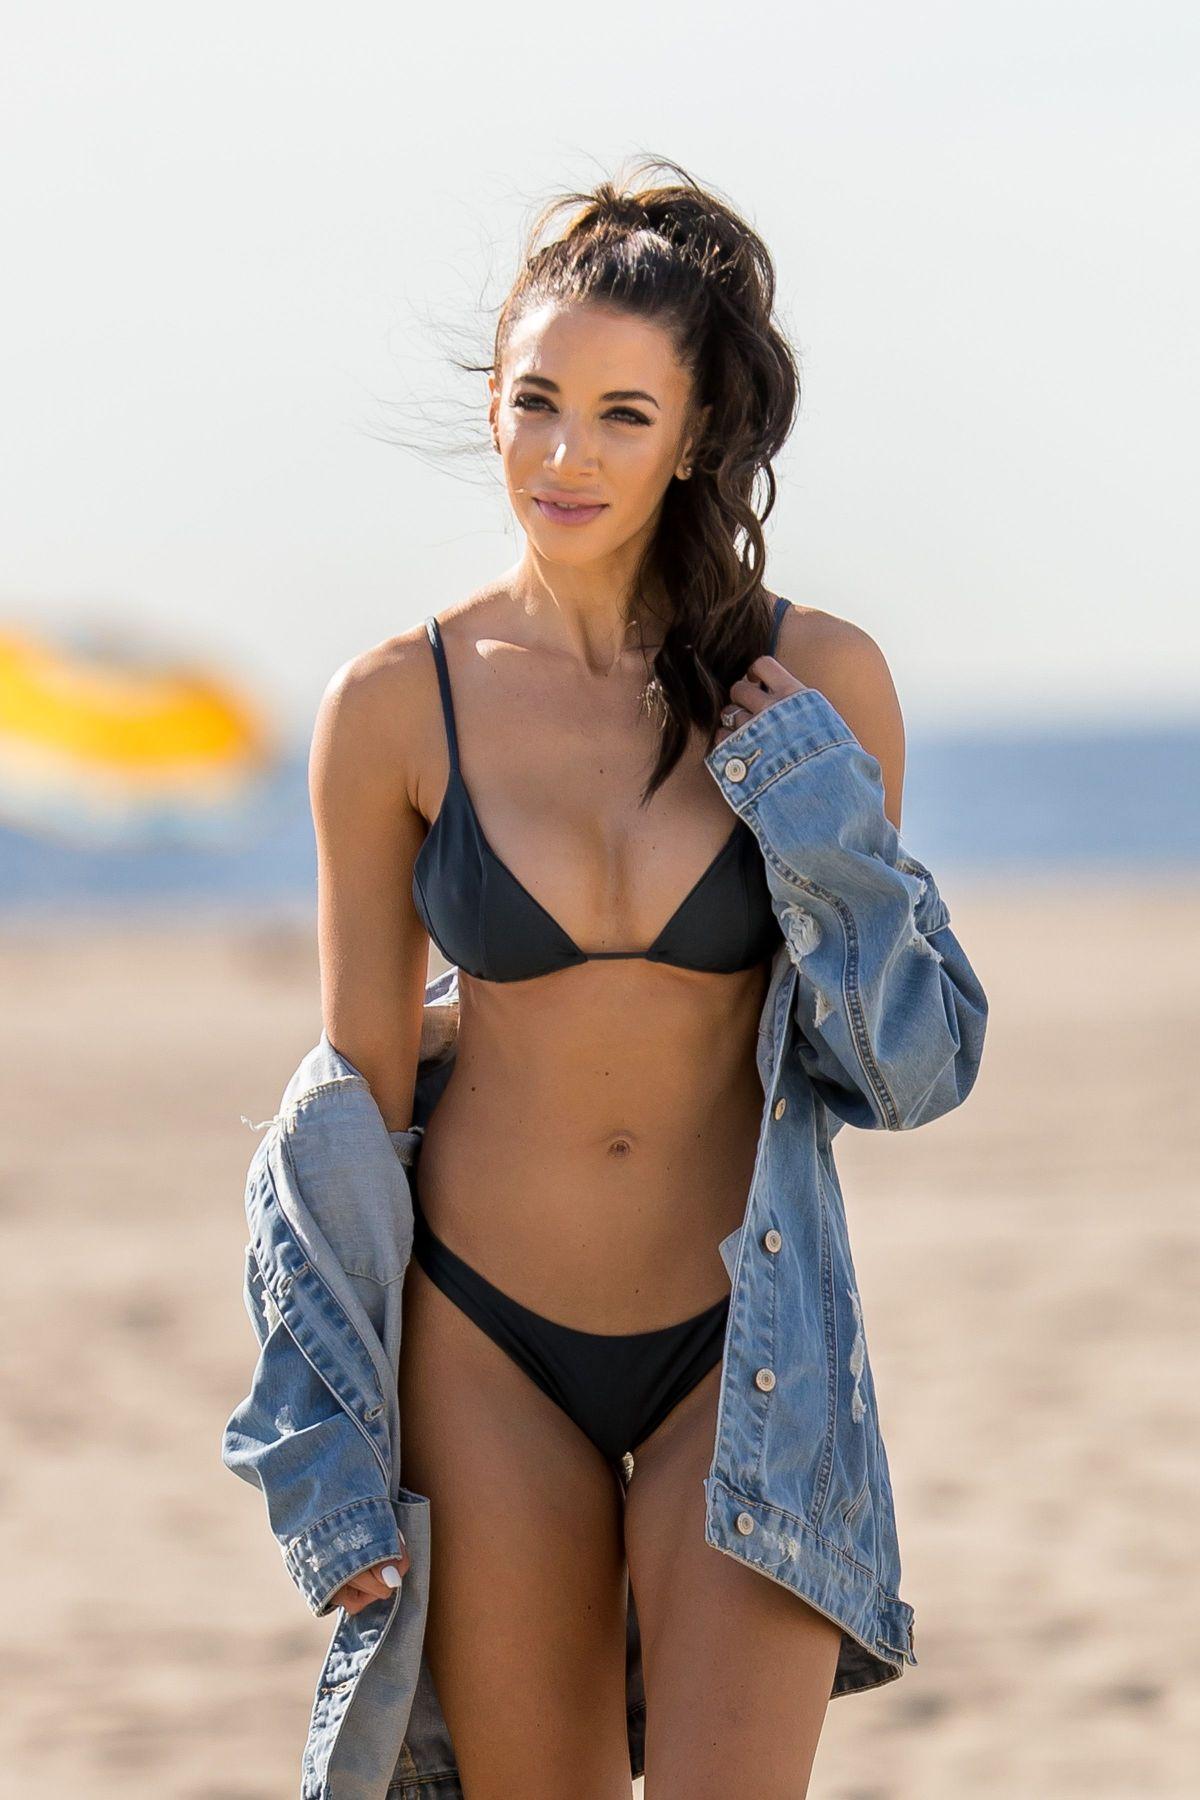 Jessica Rose Moor in Bikini on the beach in Barbados Pic 8 of 35